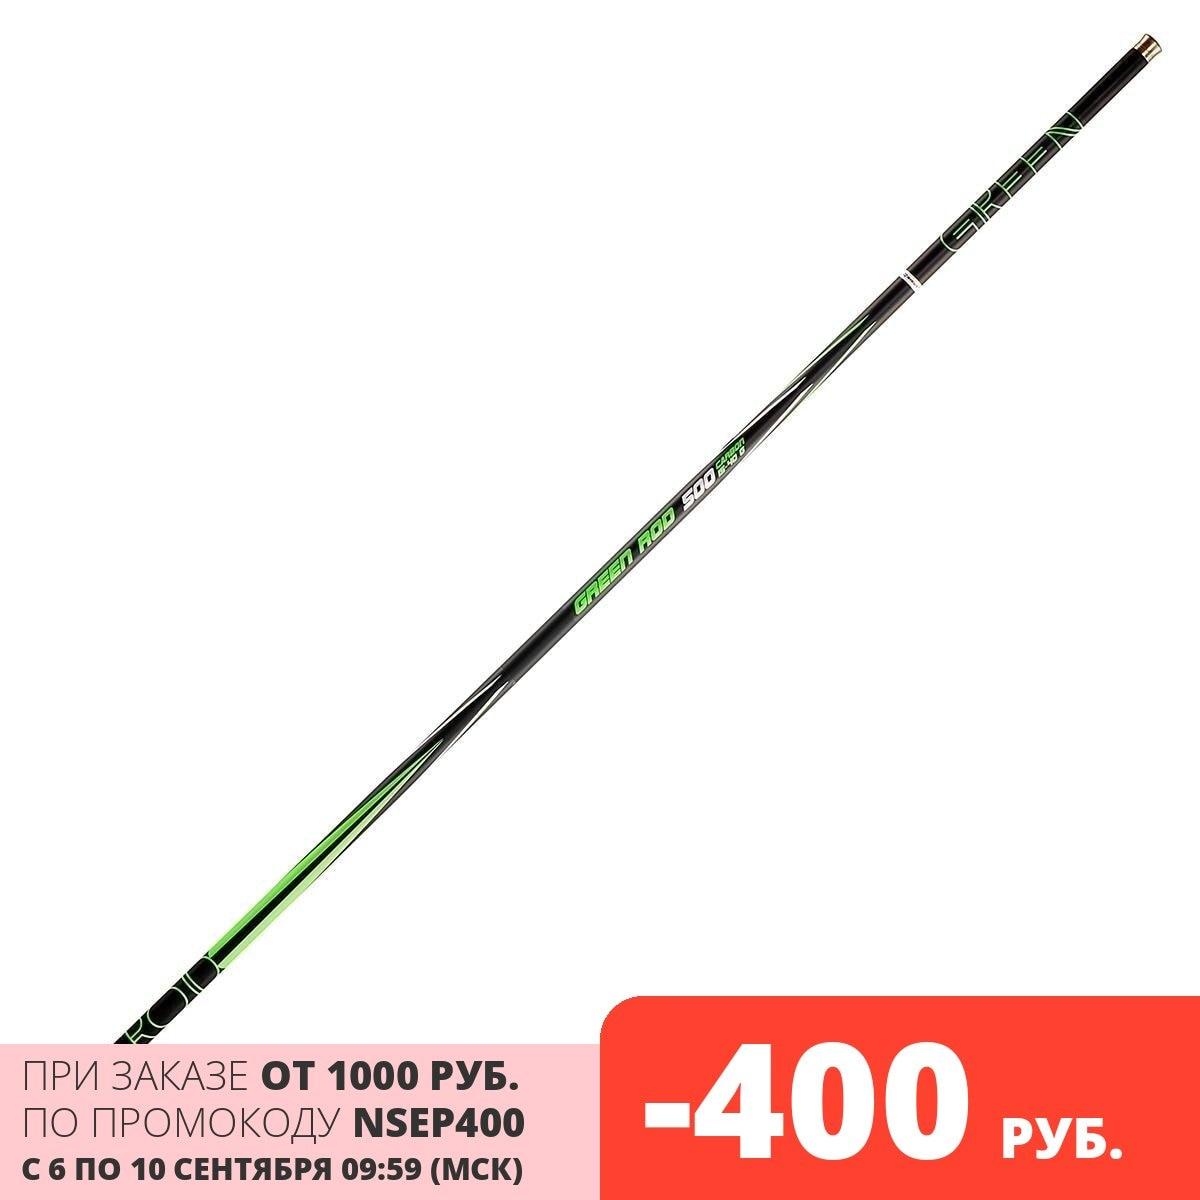 Удилище маховое NISUS GREEN ROD carbon, 5m, 15-40g (N-GR-500)